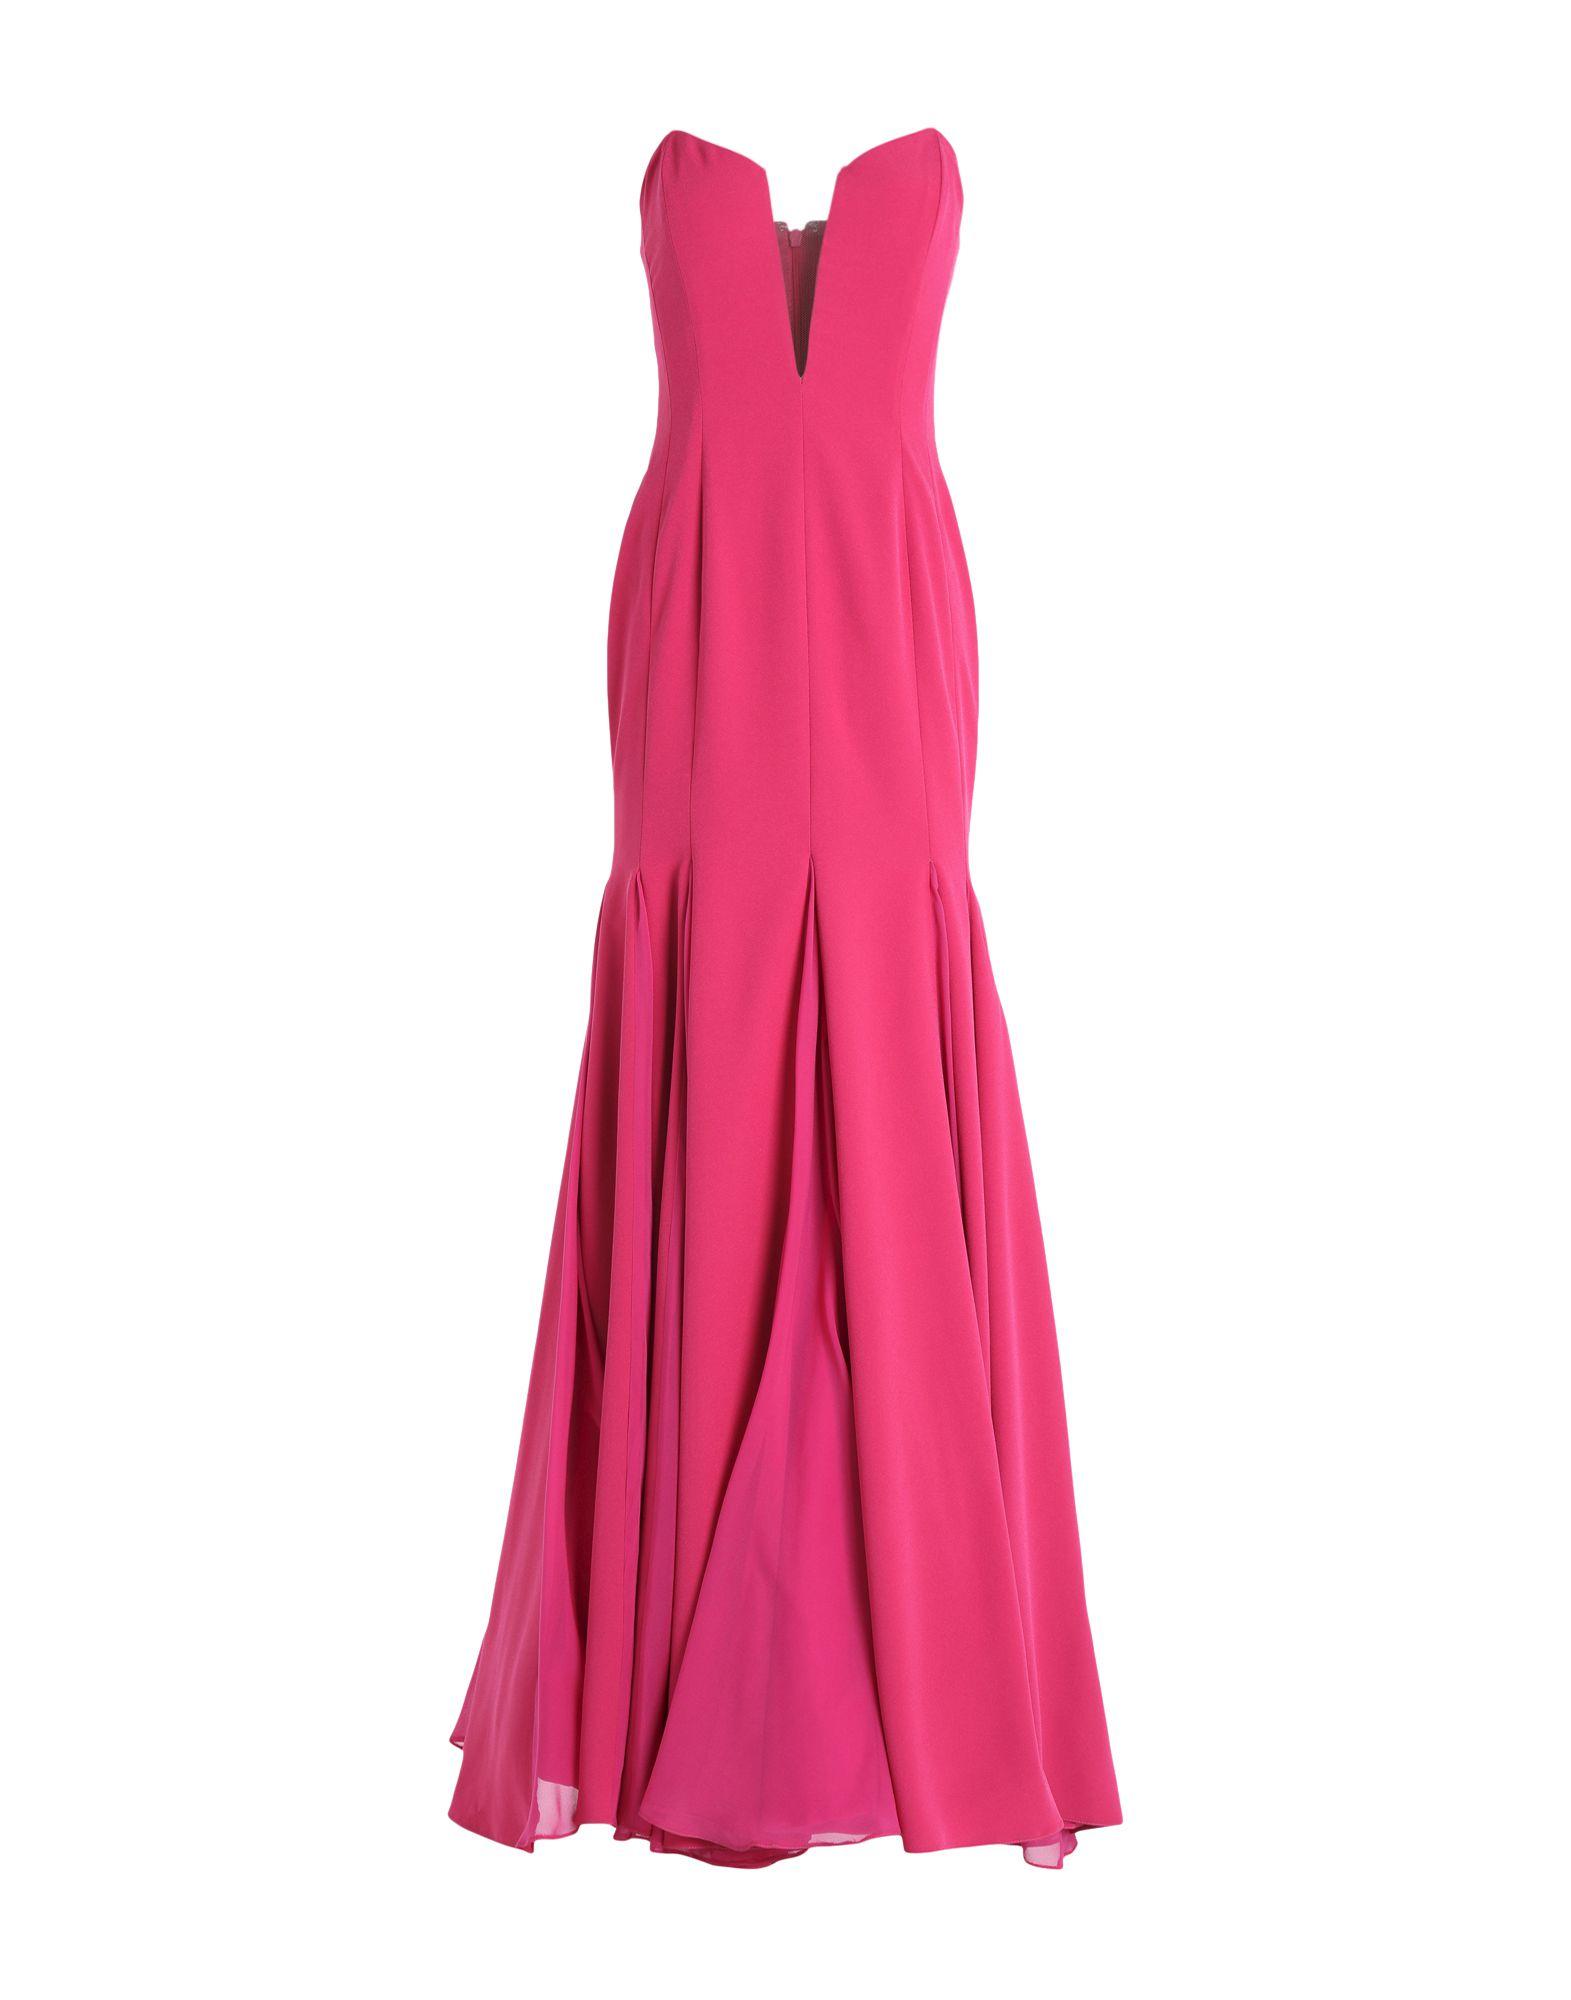 FRANCESCO PAOLO SALERNO Long Dress in Fuchsia